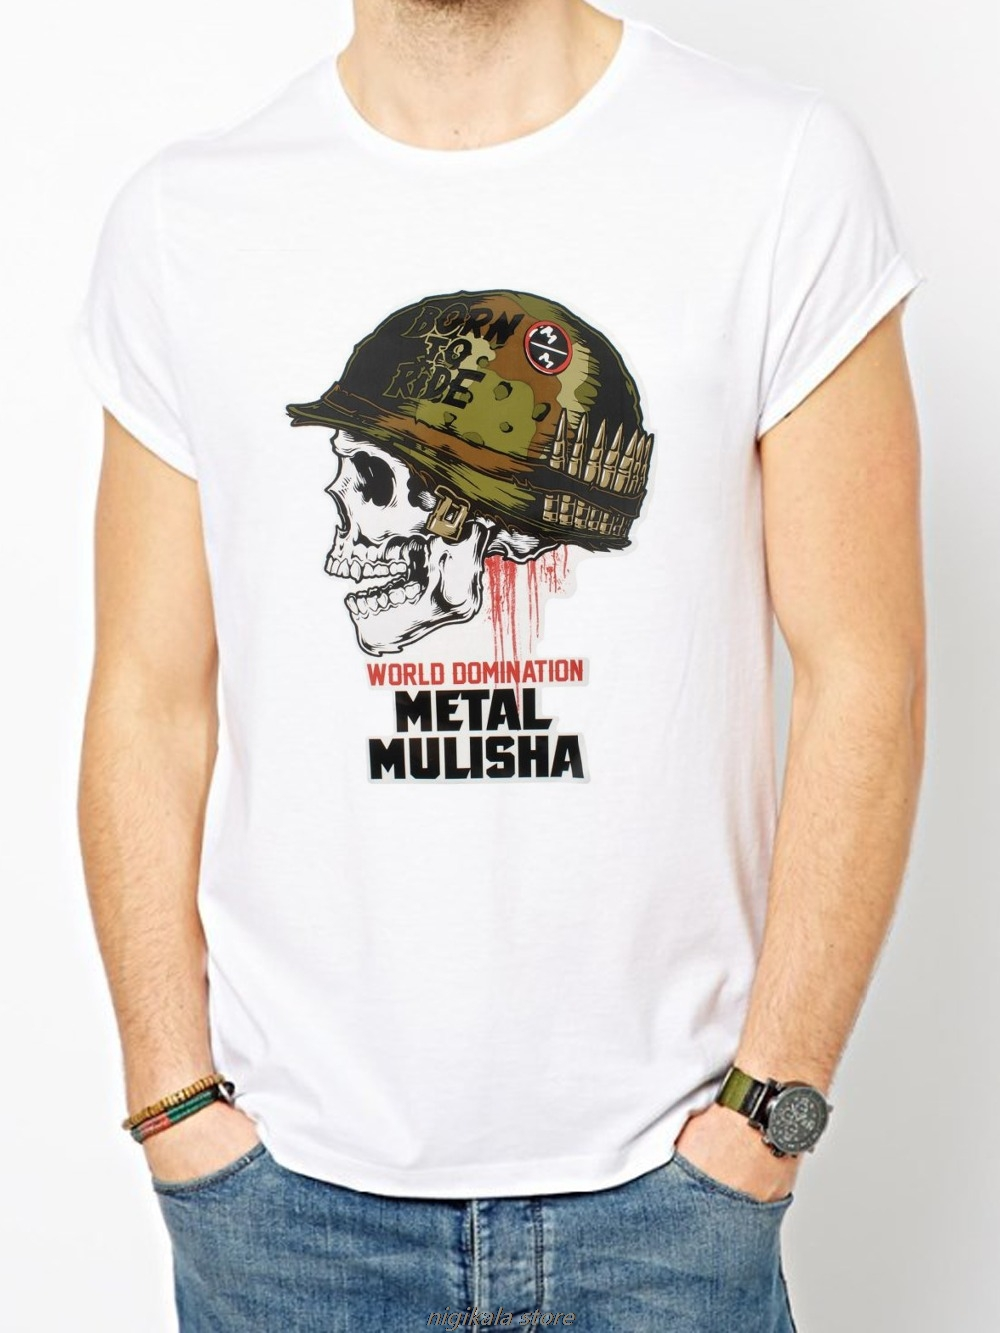 Metal Mulisha T-shirt homme dissoudre Motocross Racing Navy Blue Fox Small $30 NOUVEAU